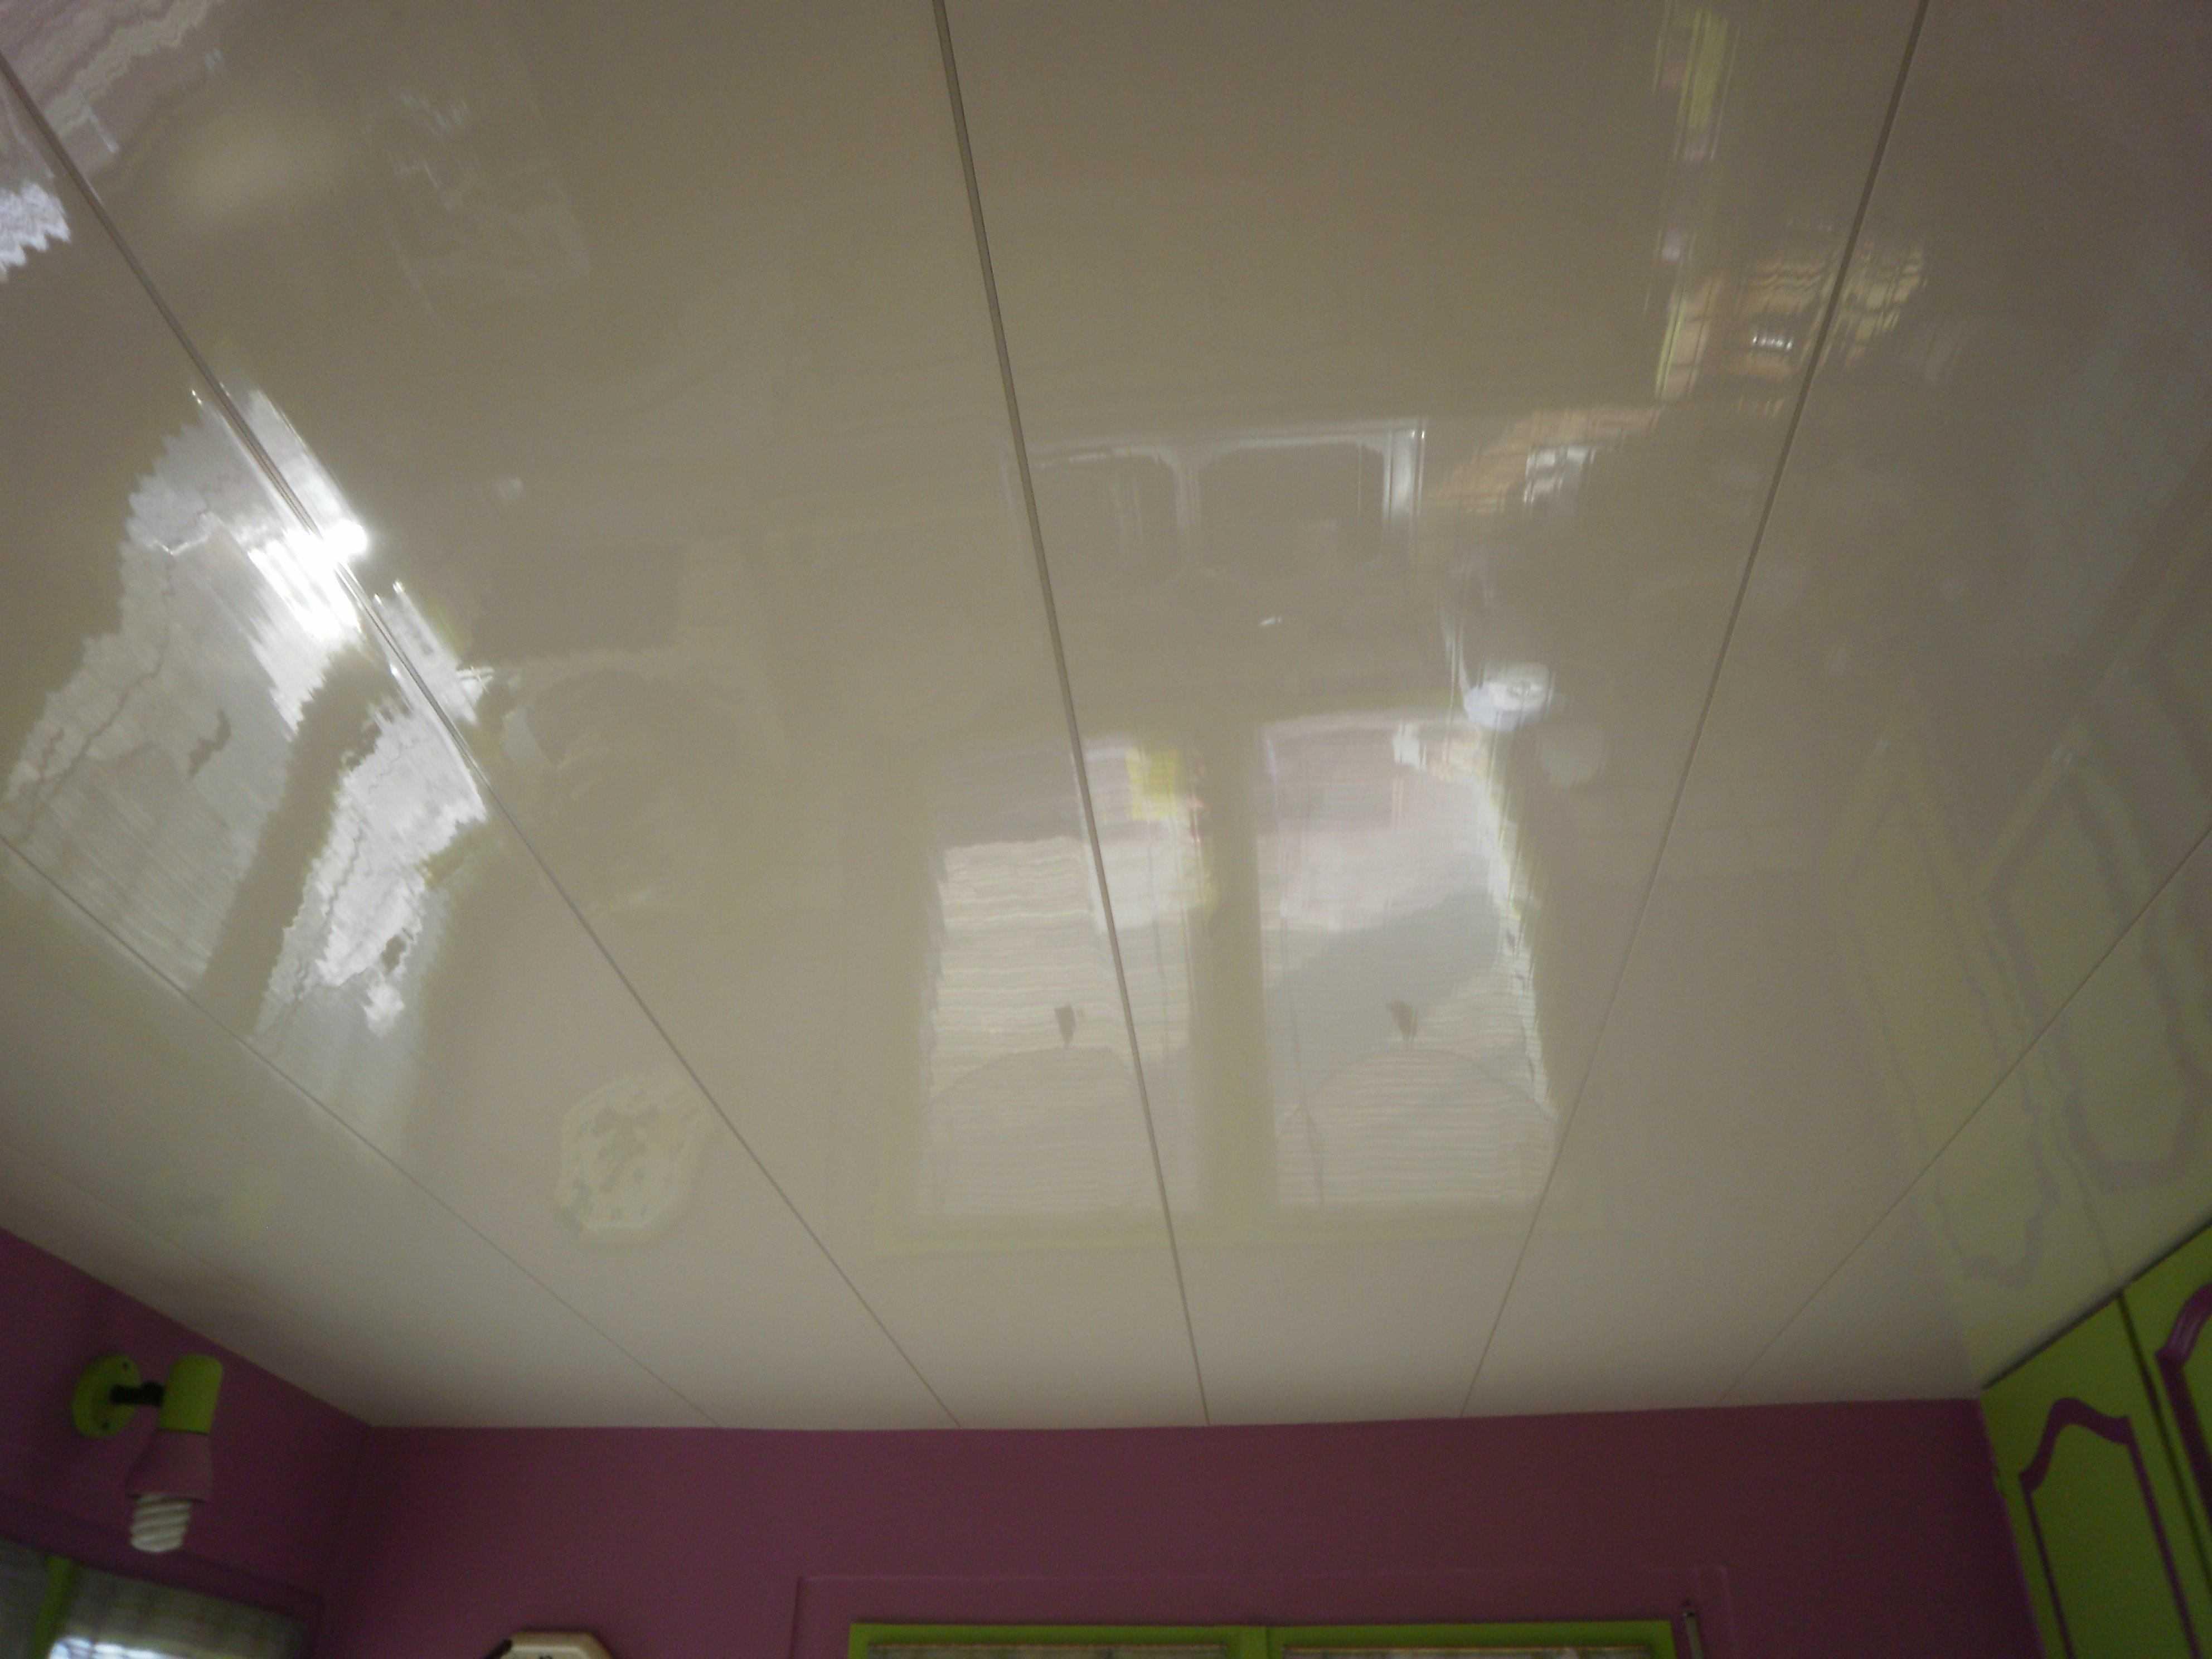 plafond suspendu. Black Bedroom Furniture Sets. Home Design Ideas